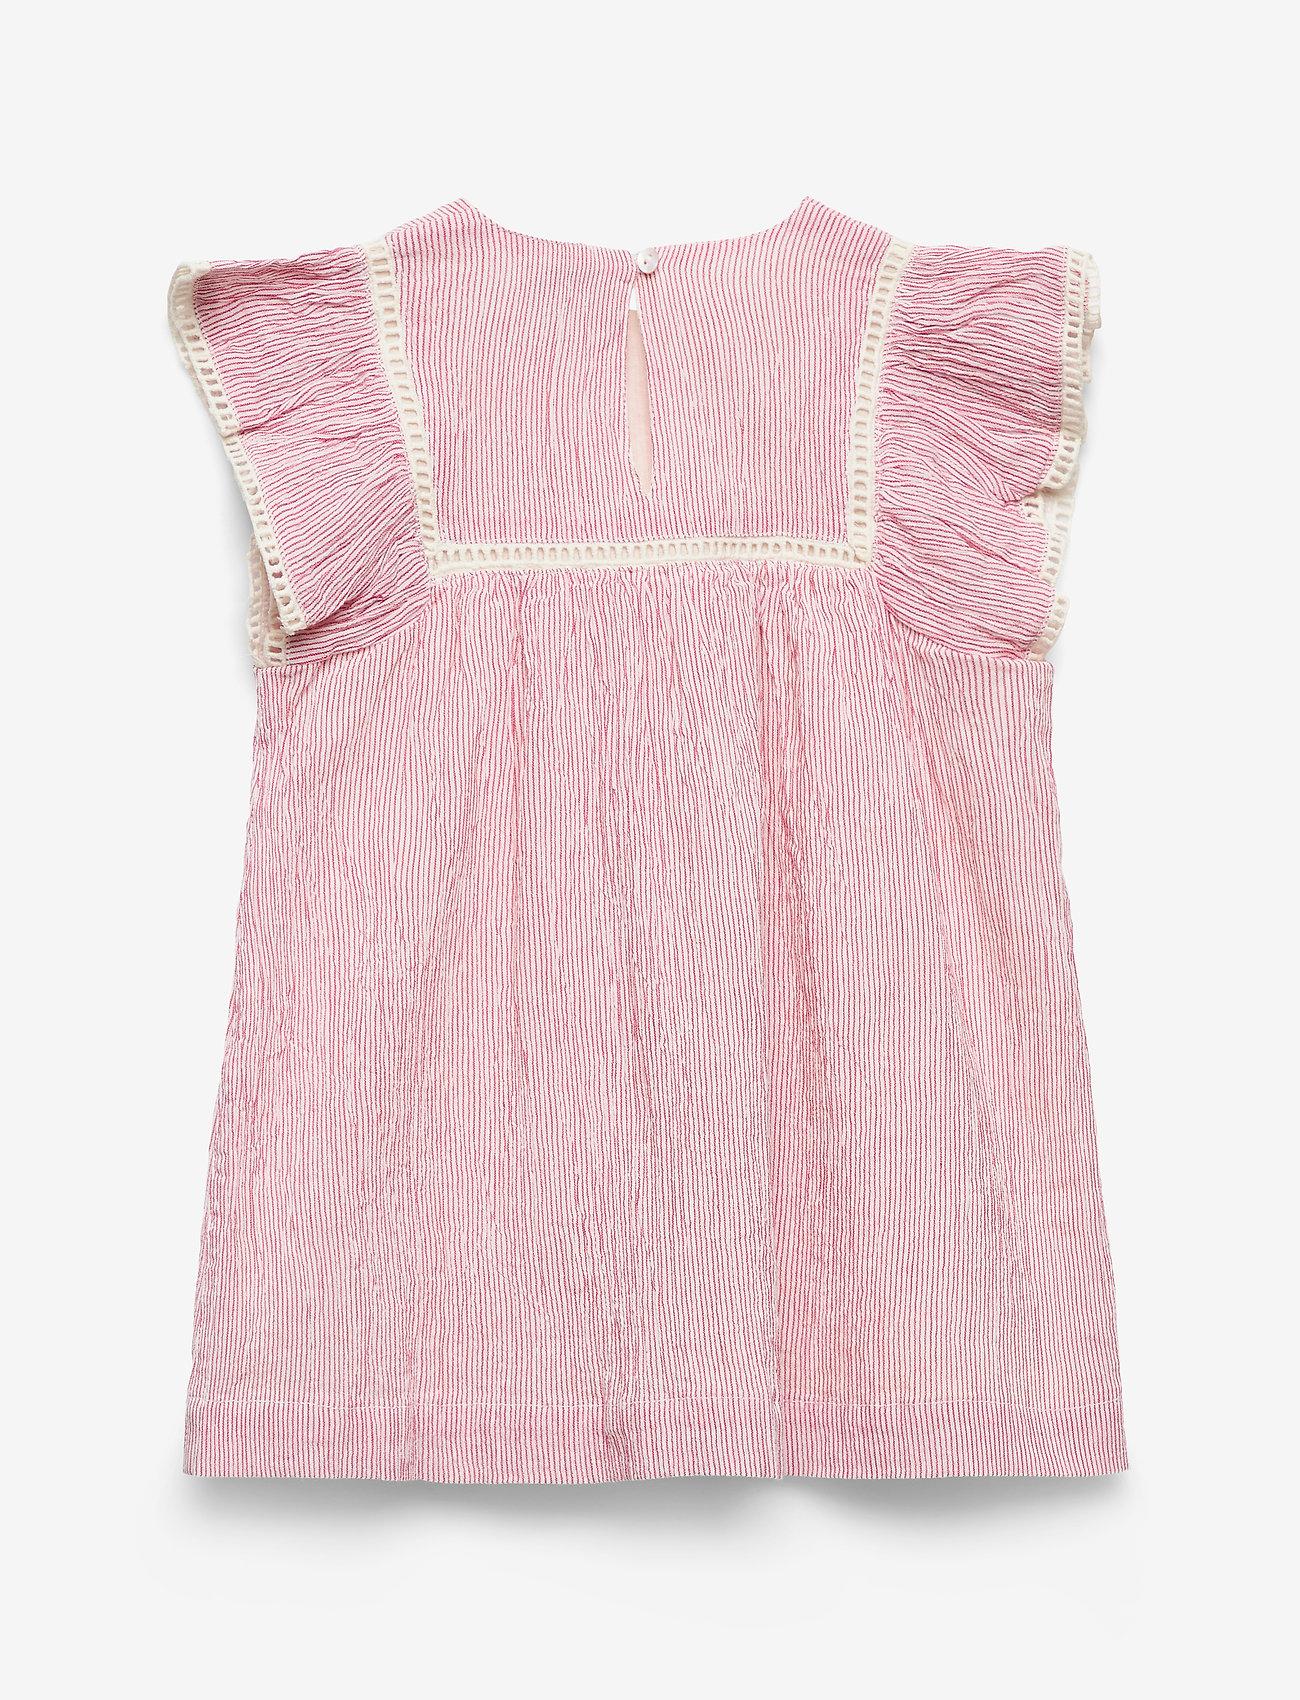 Noa Noa Miniature - Dress sleeveless - dresses - paprika - 1